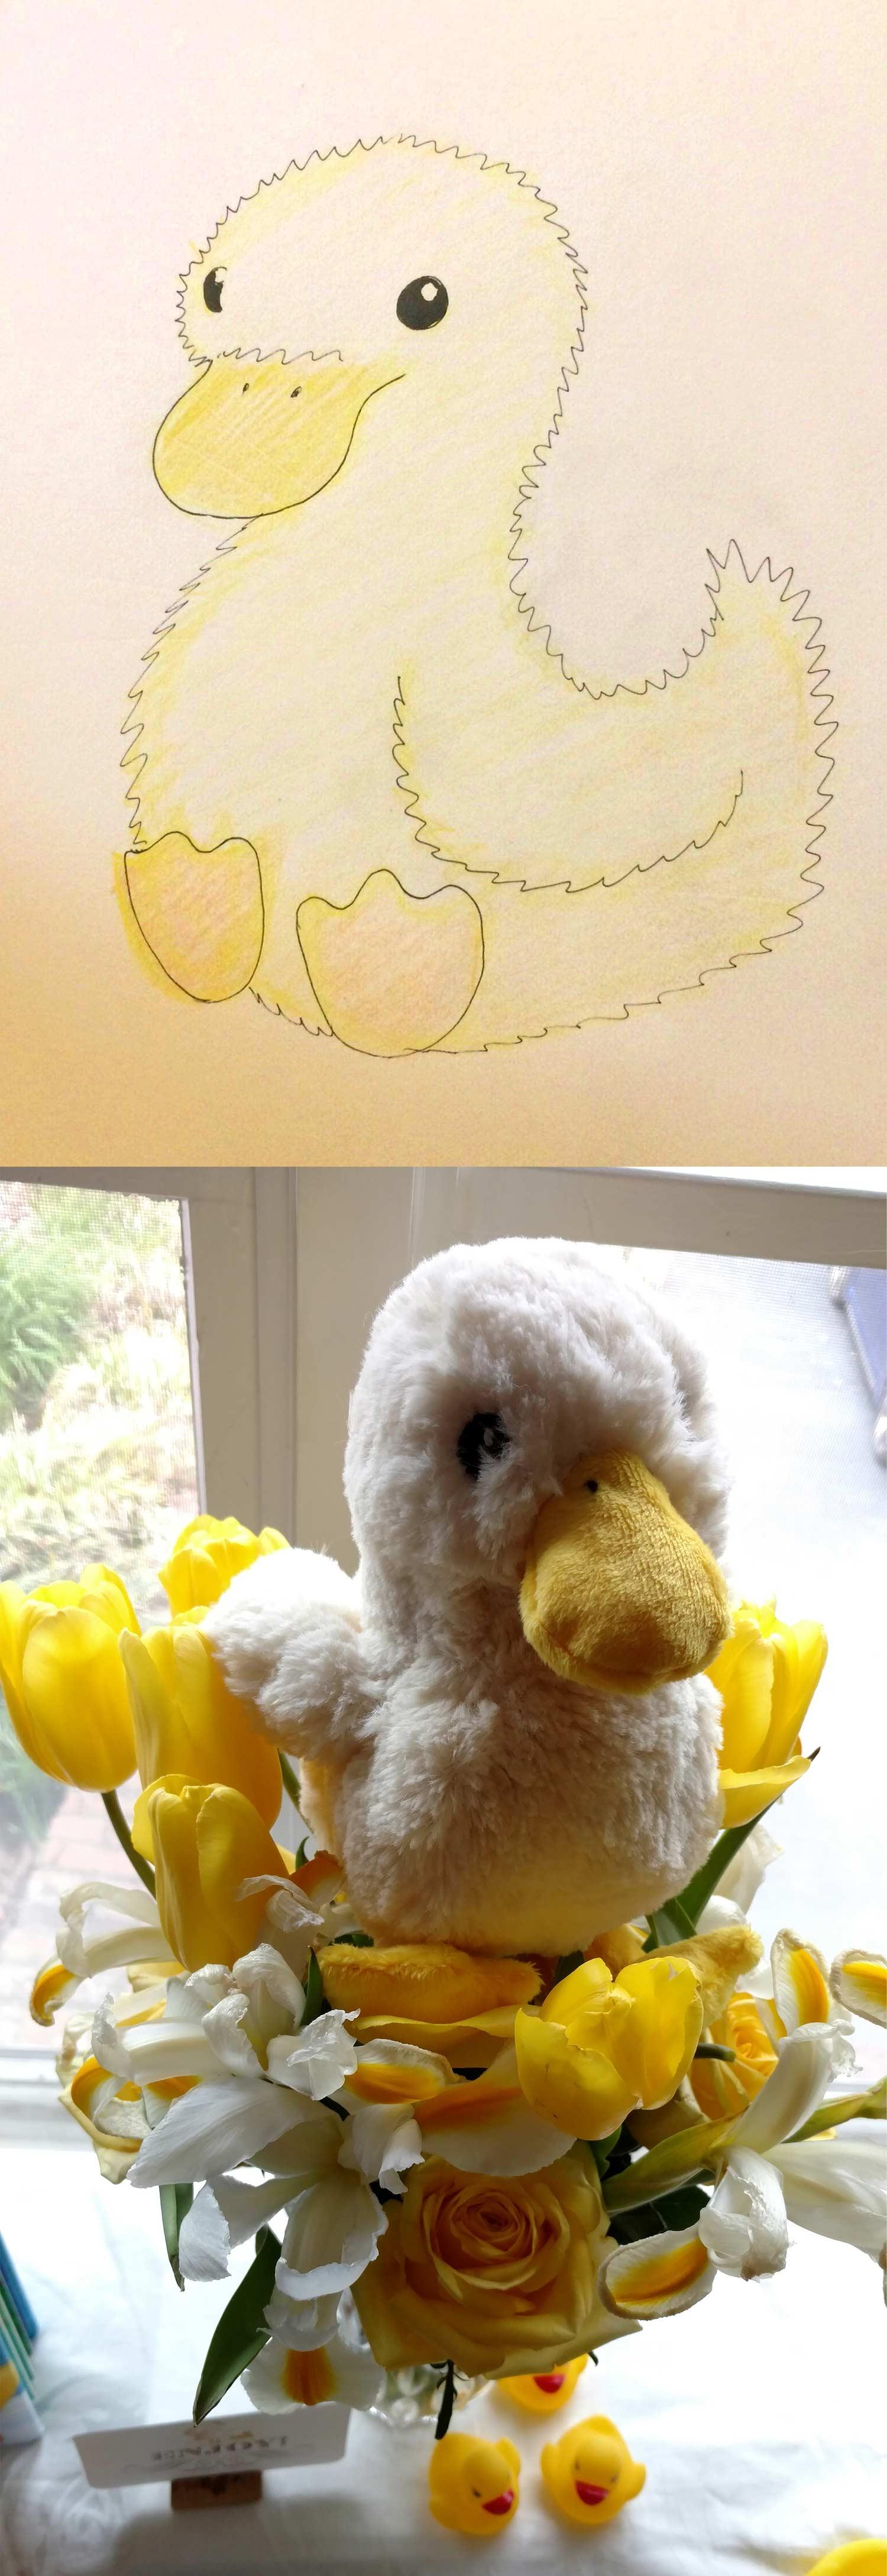 Custom Yellow Ducks LMH.jpg